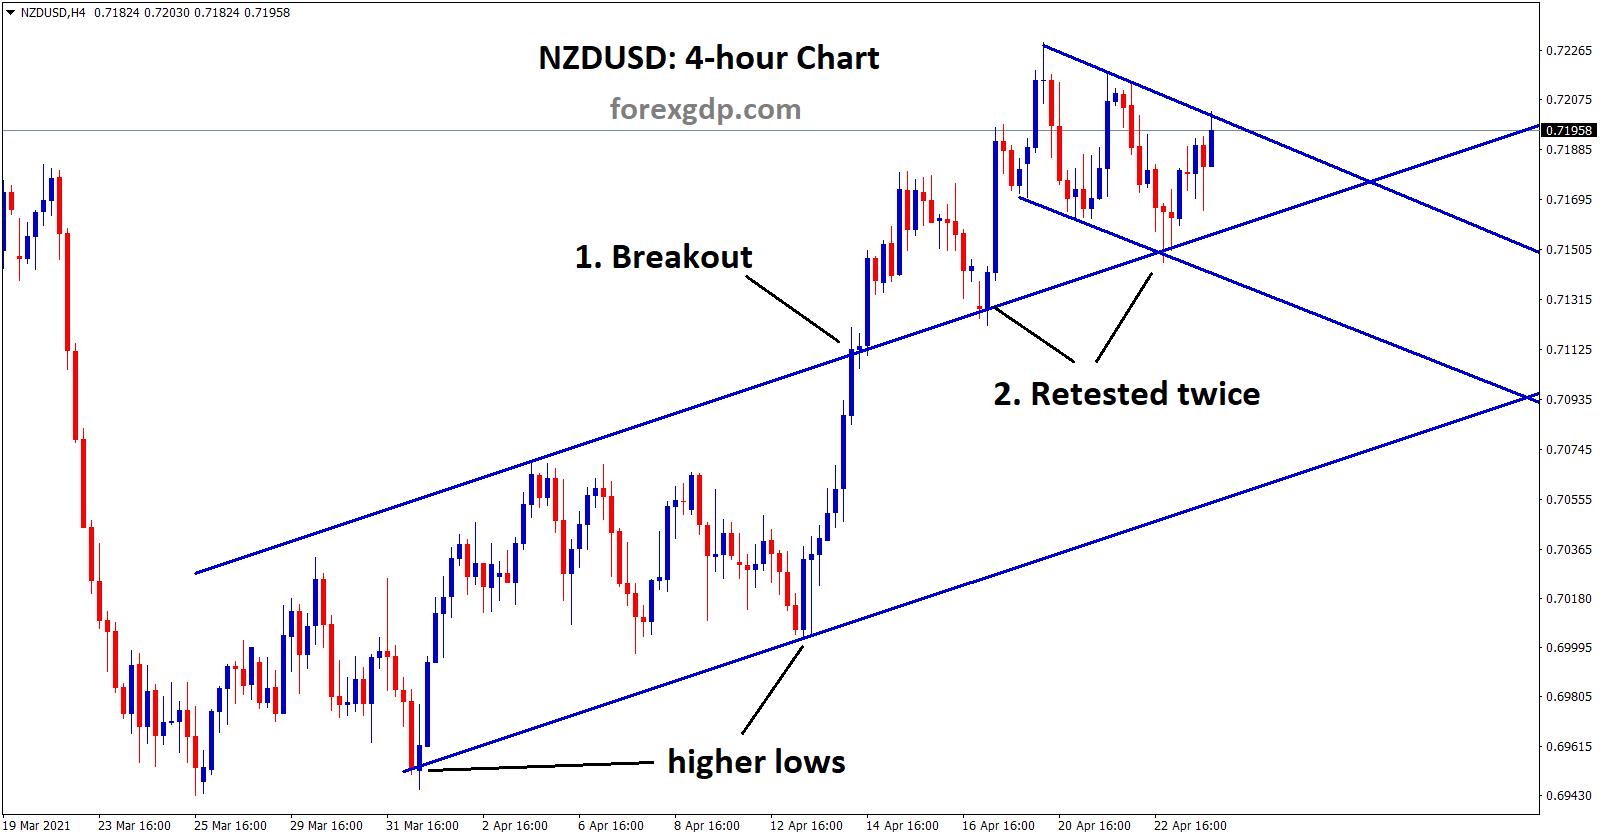 NZDUSD retested the broken level twice